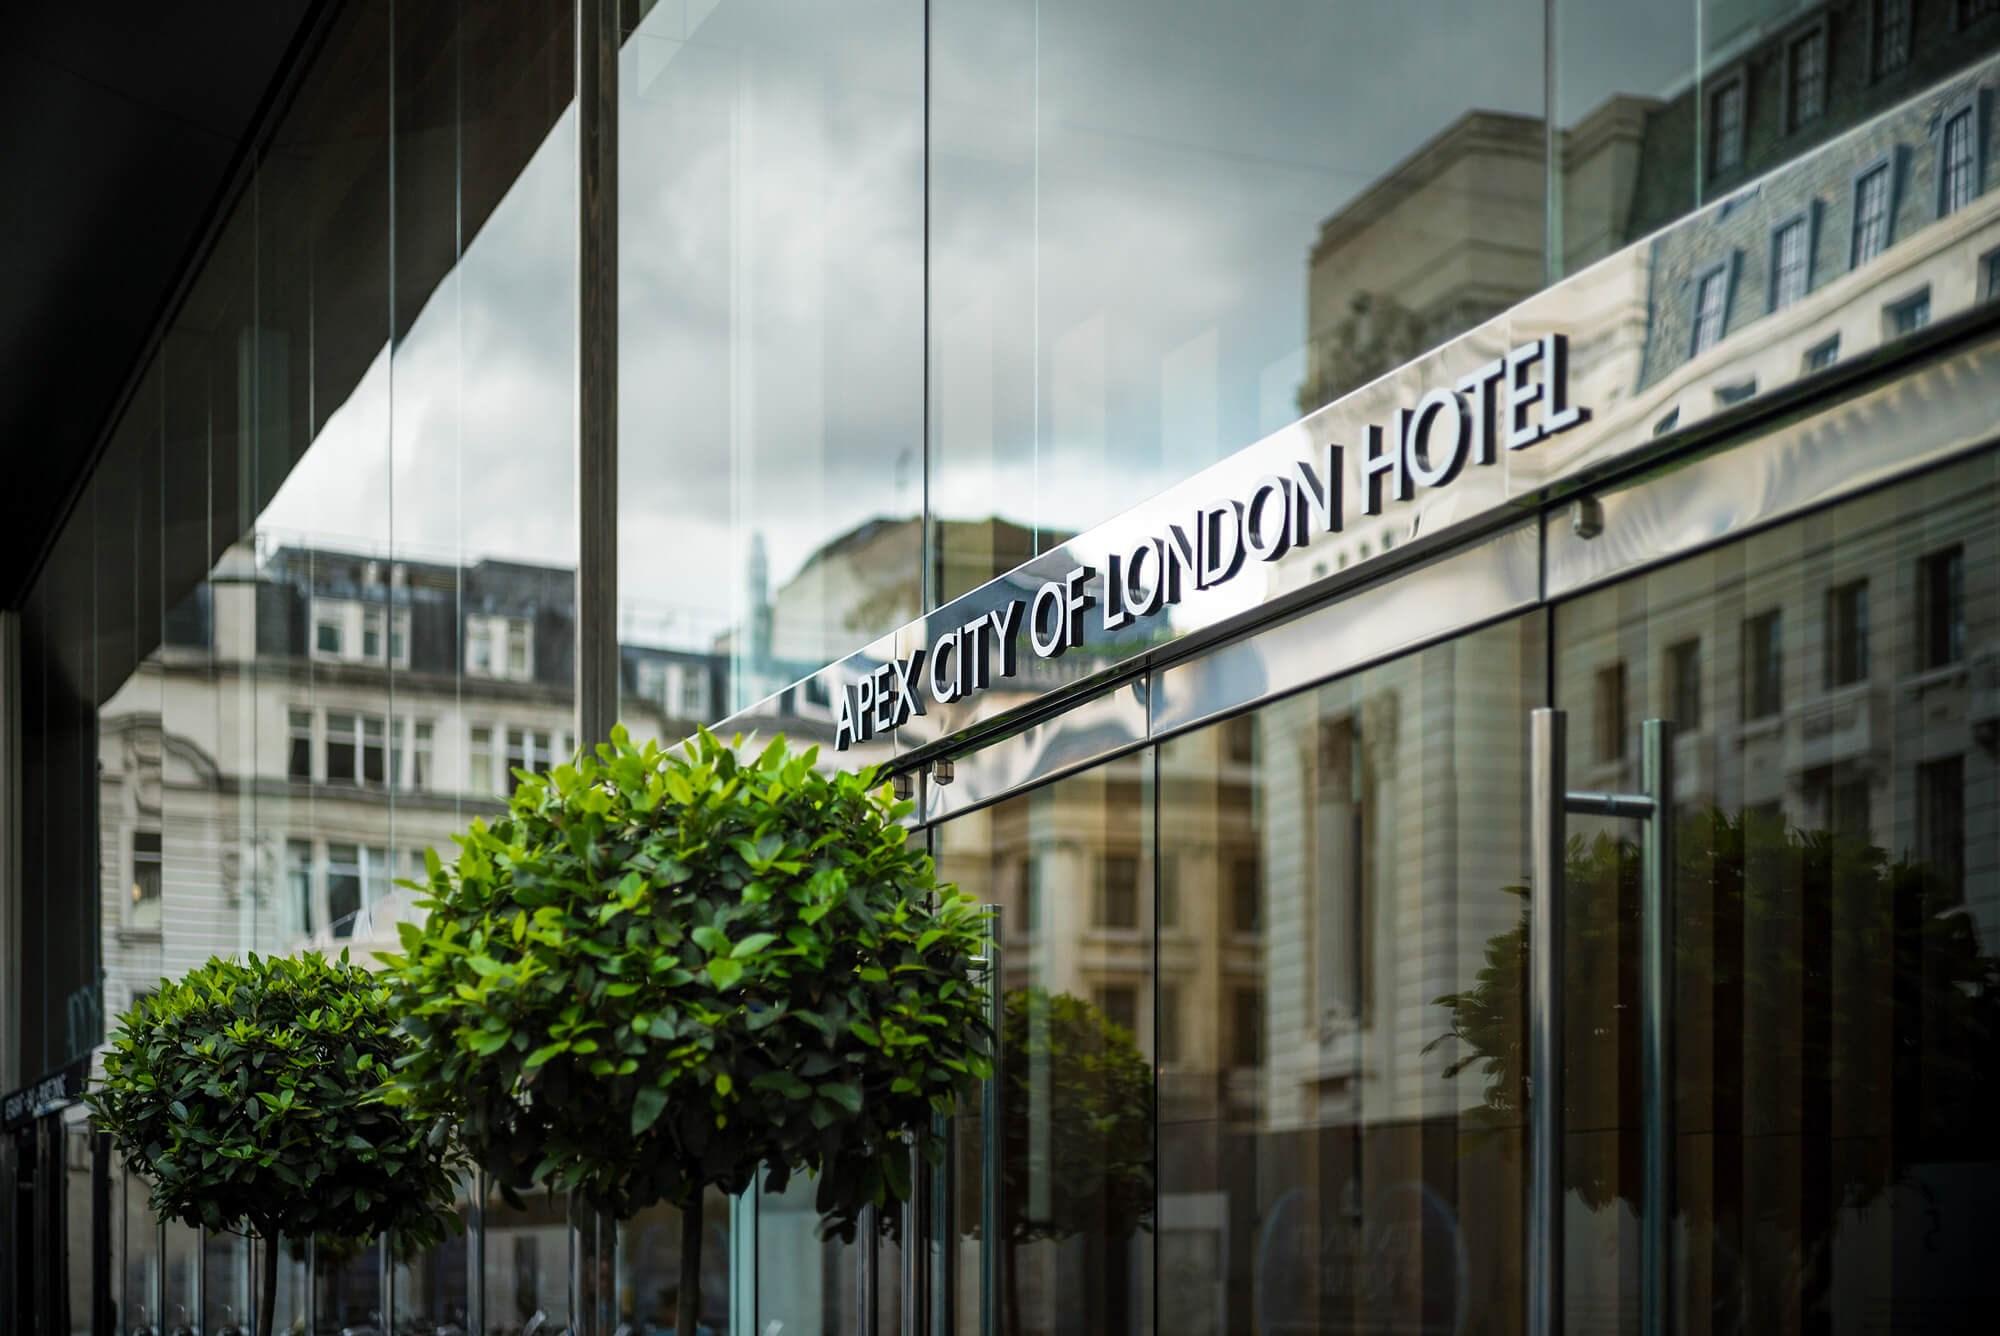 Apex City of London Hotel entrance